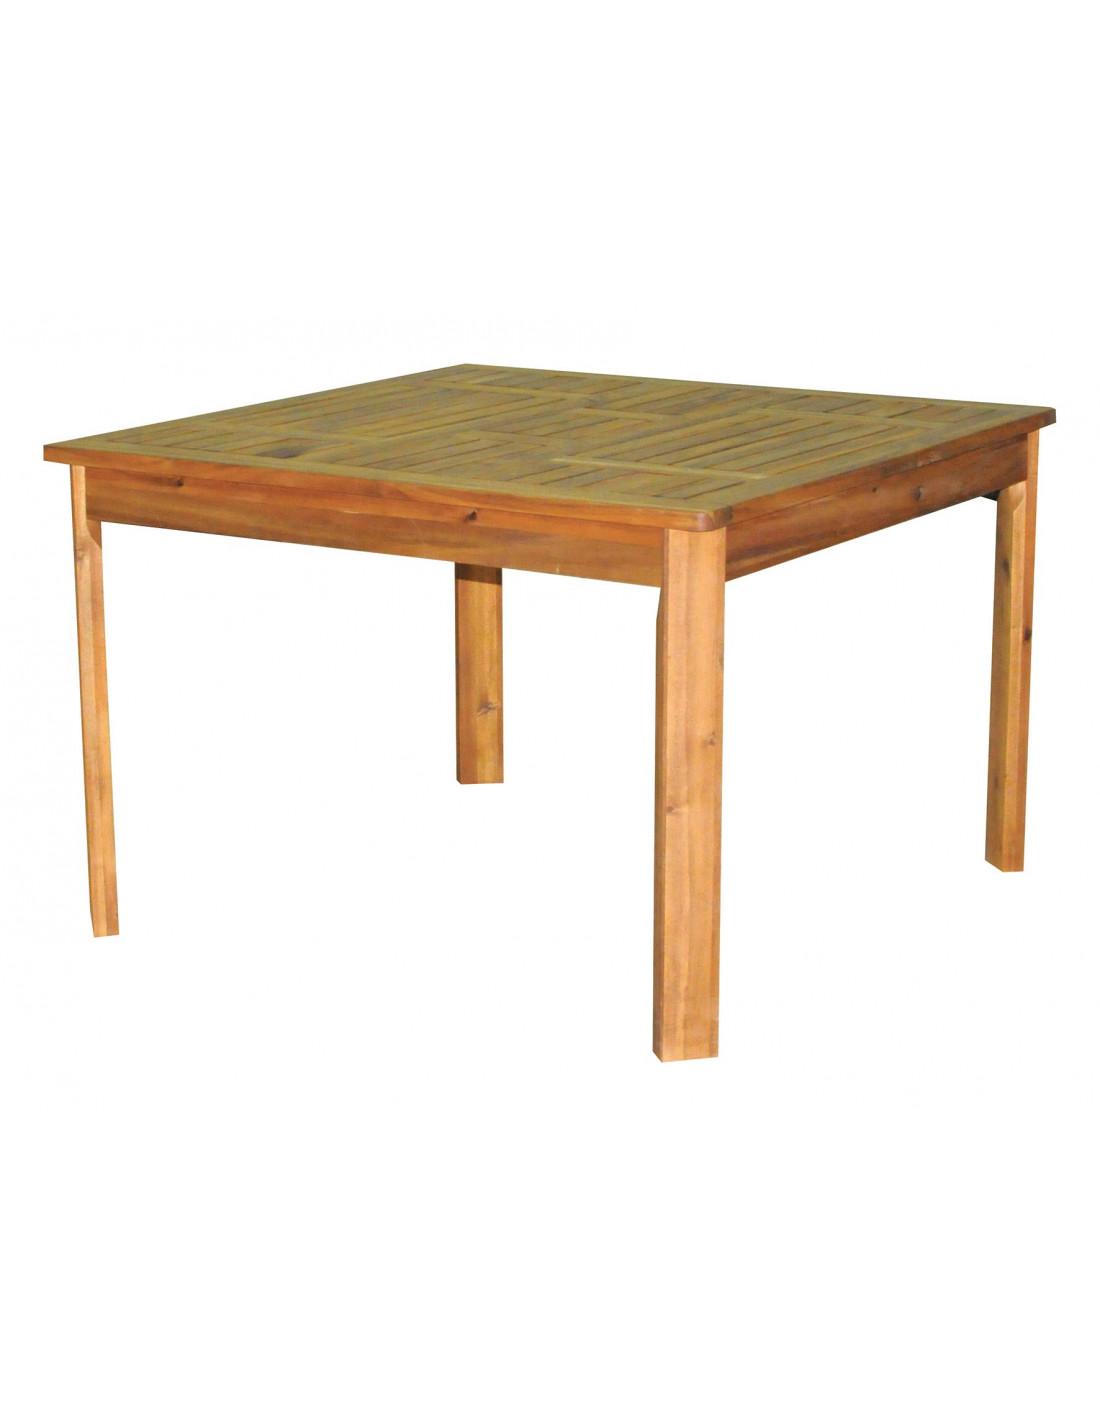 Table acacia 110x110x73cm sunl hyper brico for Table exterieur acacia